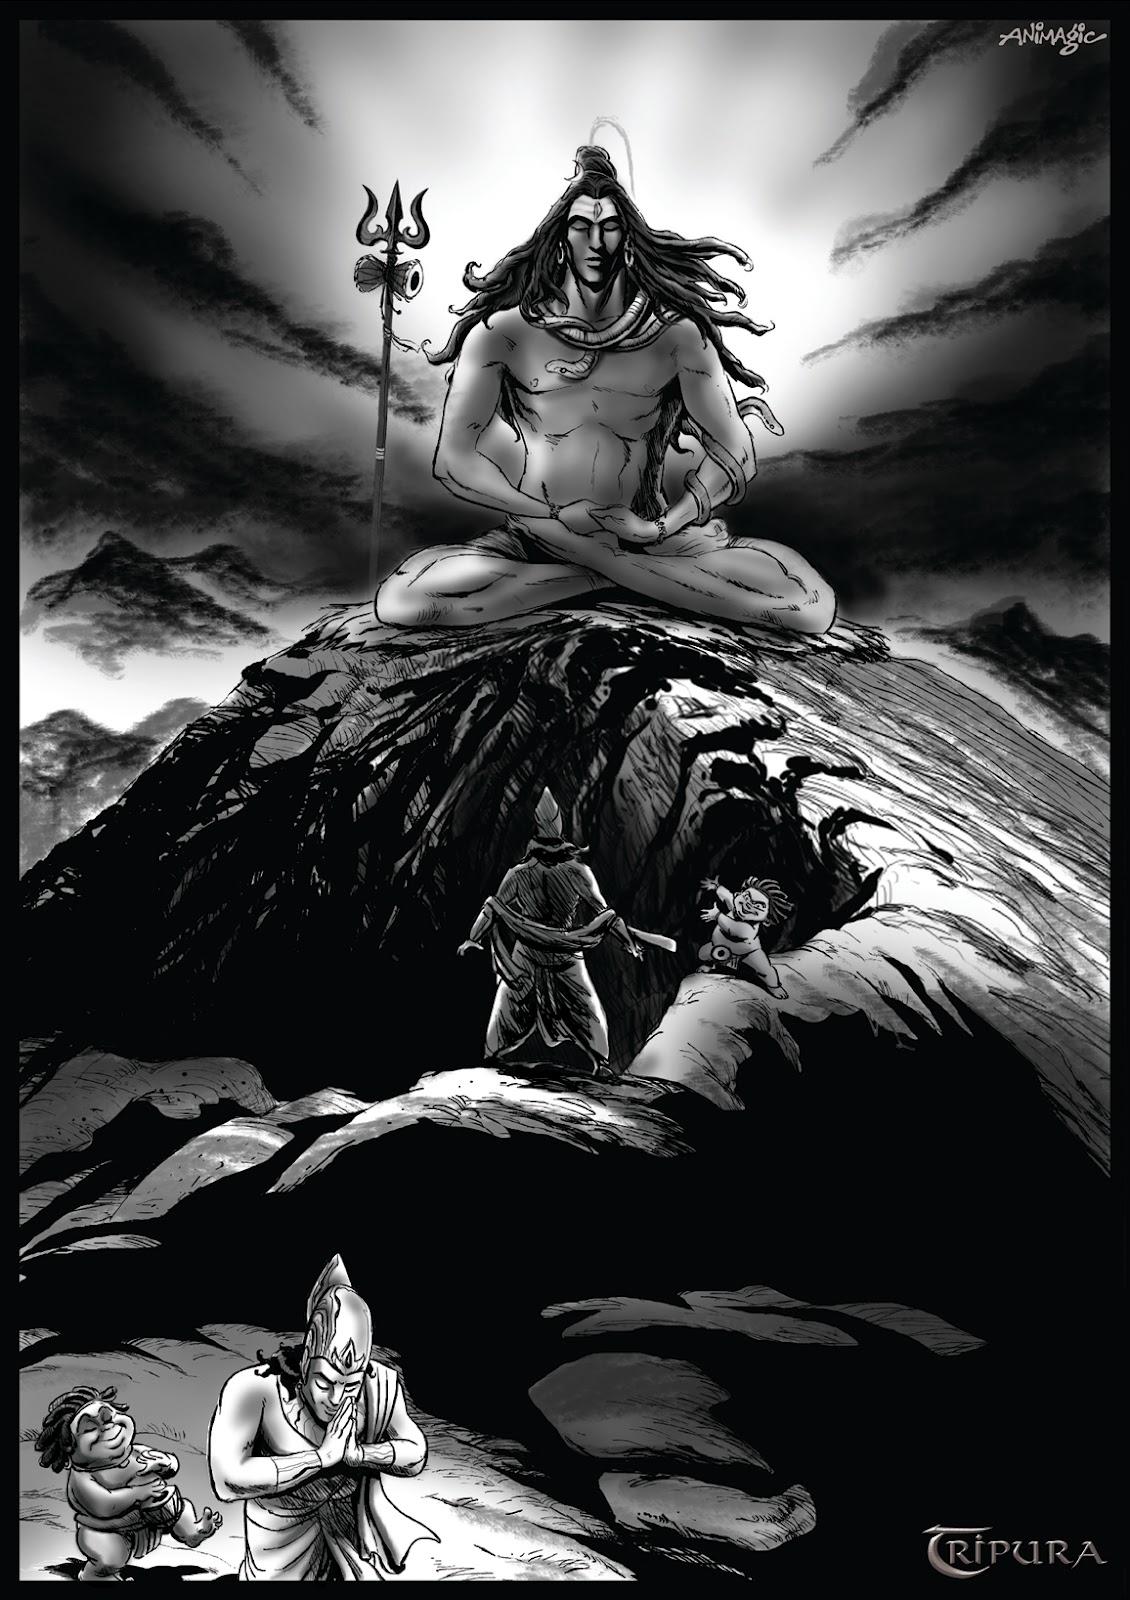 Om Namah Shivaya - Wikipedia